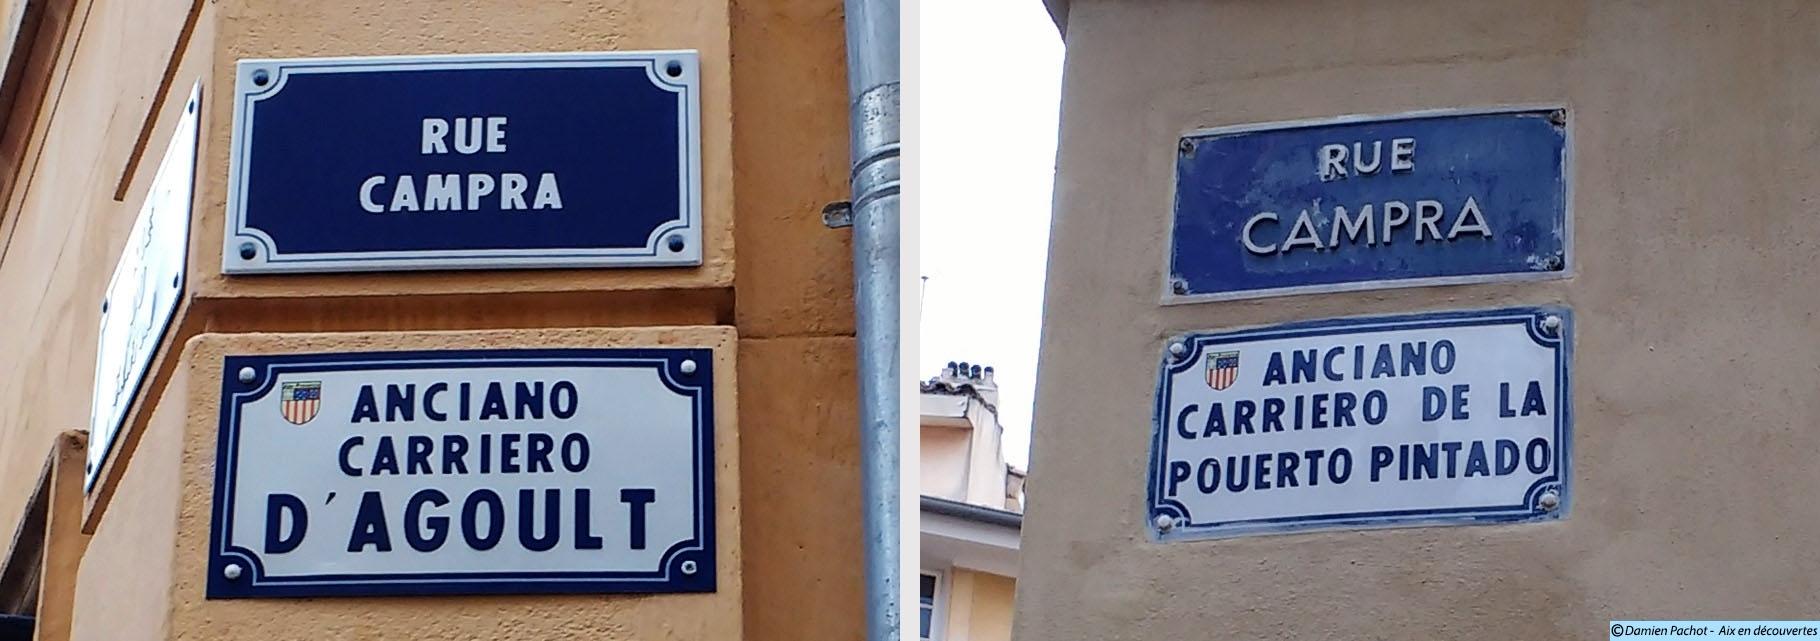 Les anciennes appellations de la rue Campra sont encore présentes